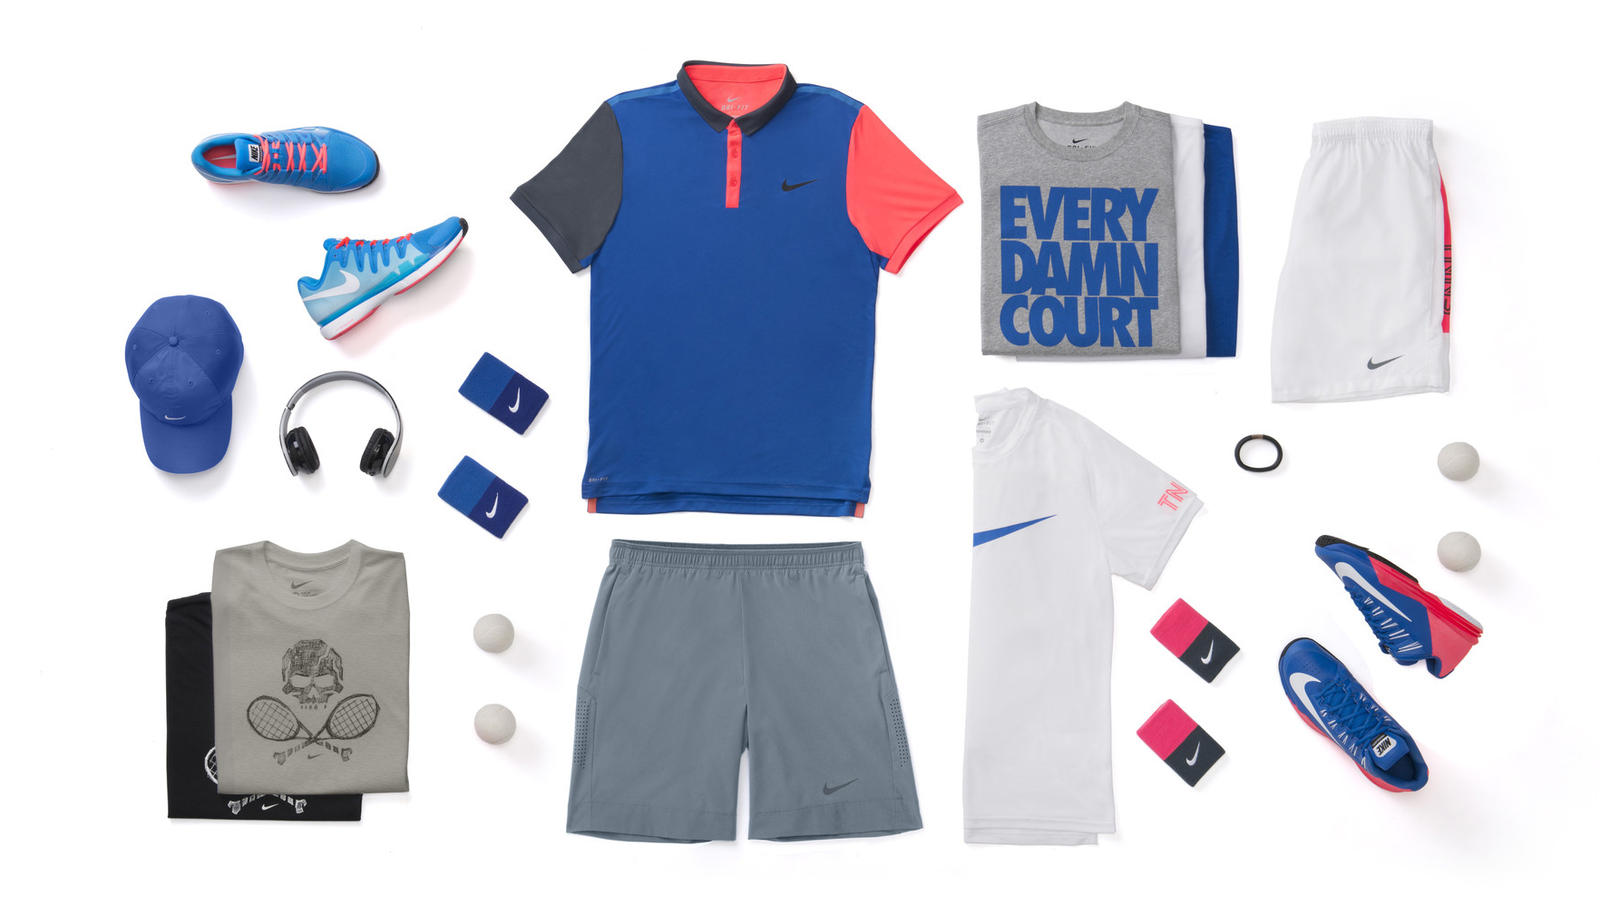 Grigor Dimitrov Nike Tennis Look - New York 2014